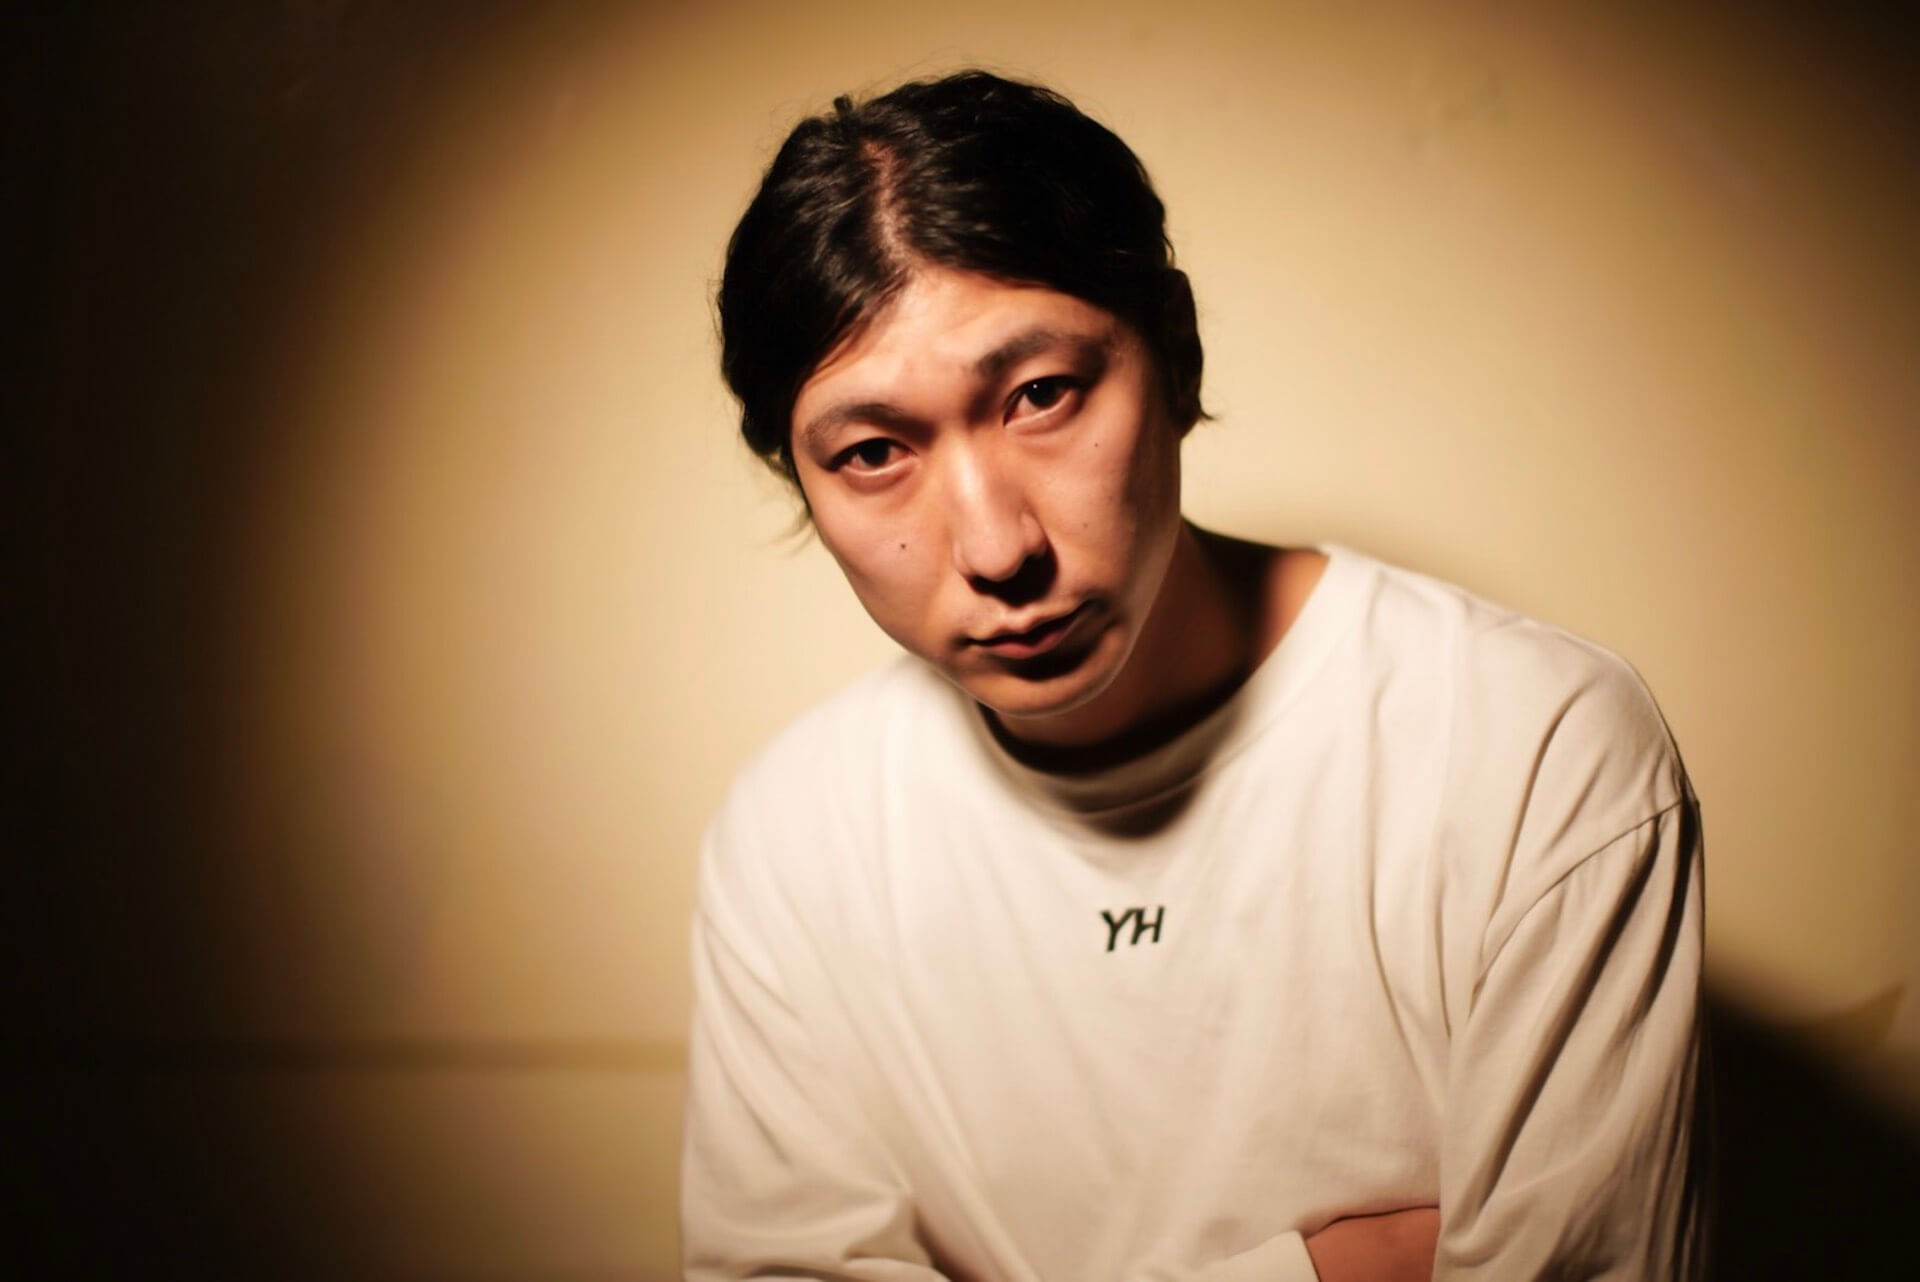 OGRE YOU ASSHOLEがホームのLIQUIDROOMにて、<Confidential>を開催決定|DJ・Yoshinori Hayashiが登場 music200317_ogreyouasshole_03